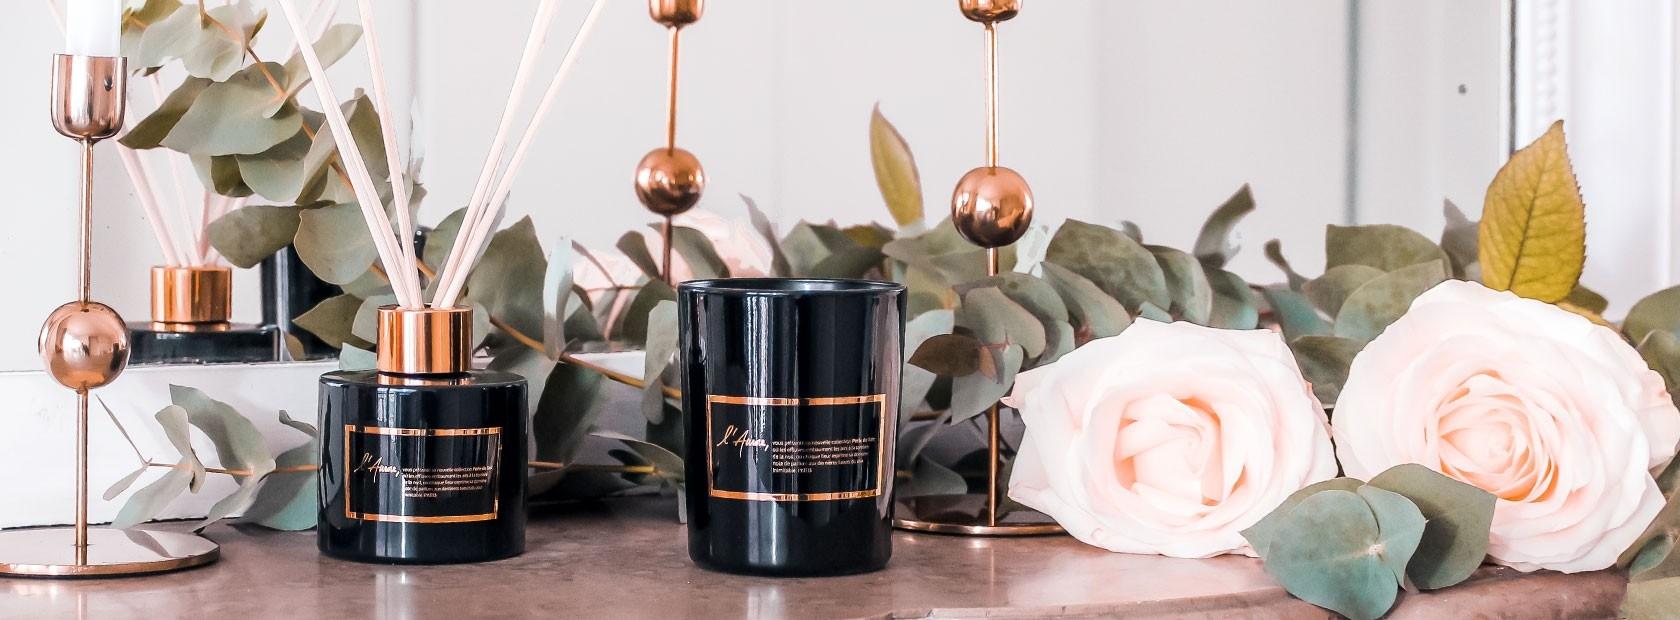 Bougie parfumee | L'Aurore Paris